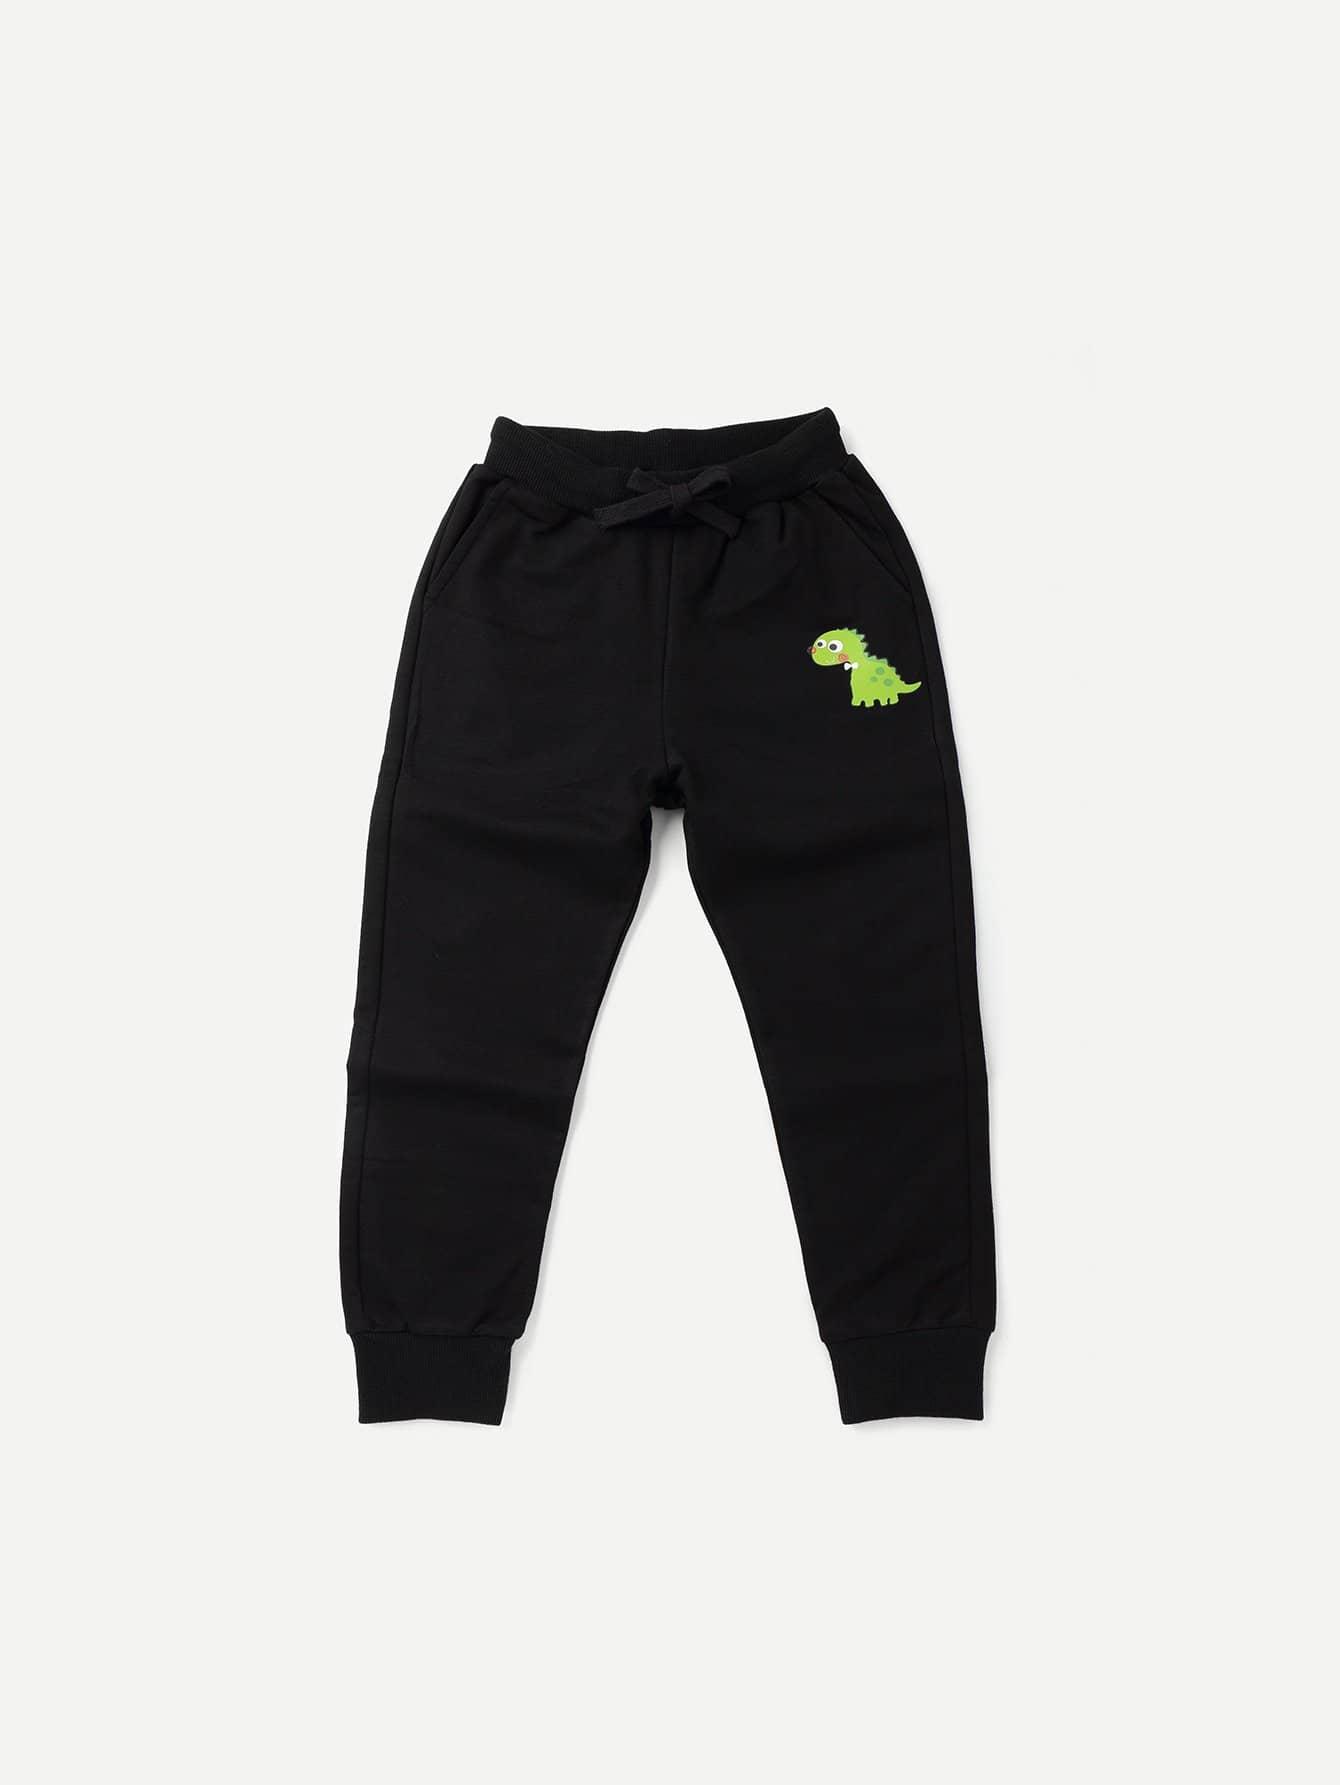 Boys Dinosaur Print Drawstring Pants